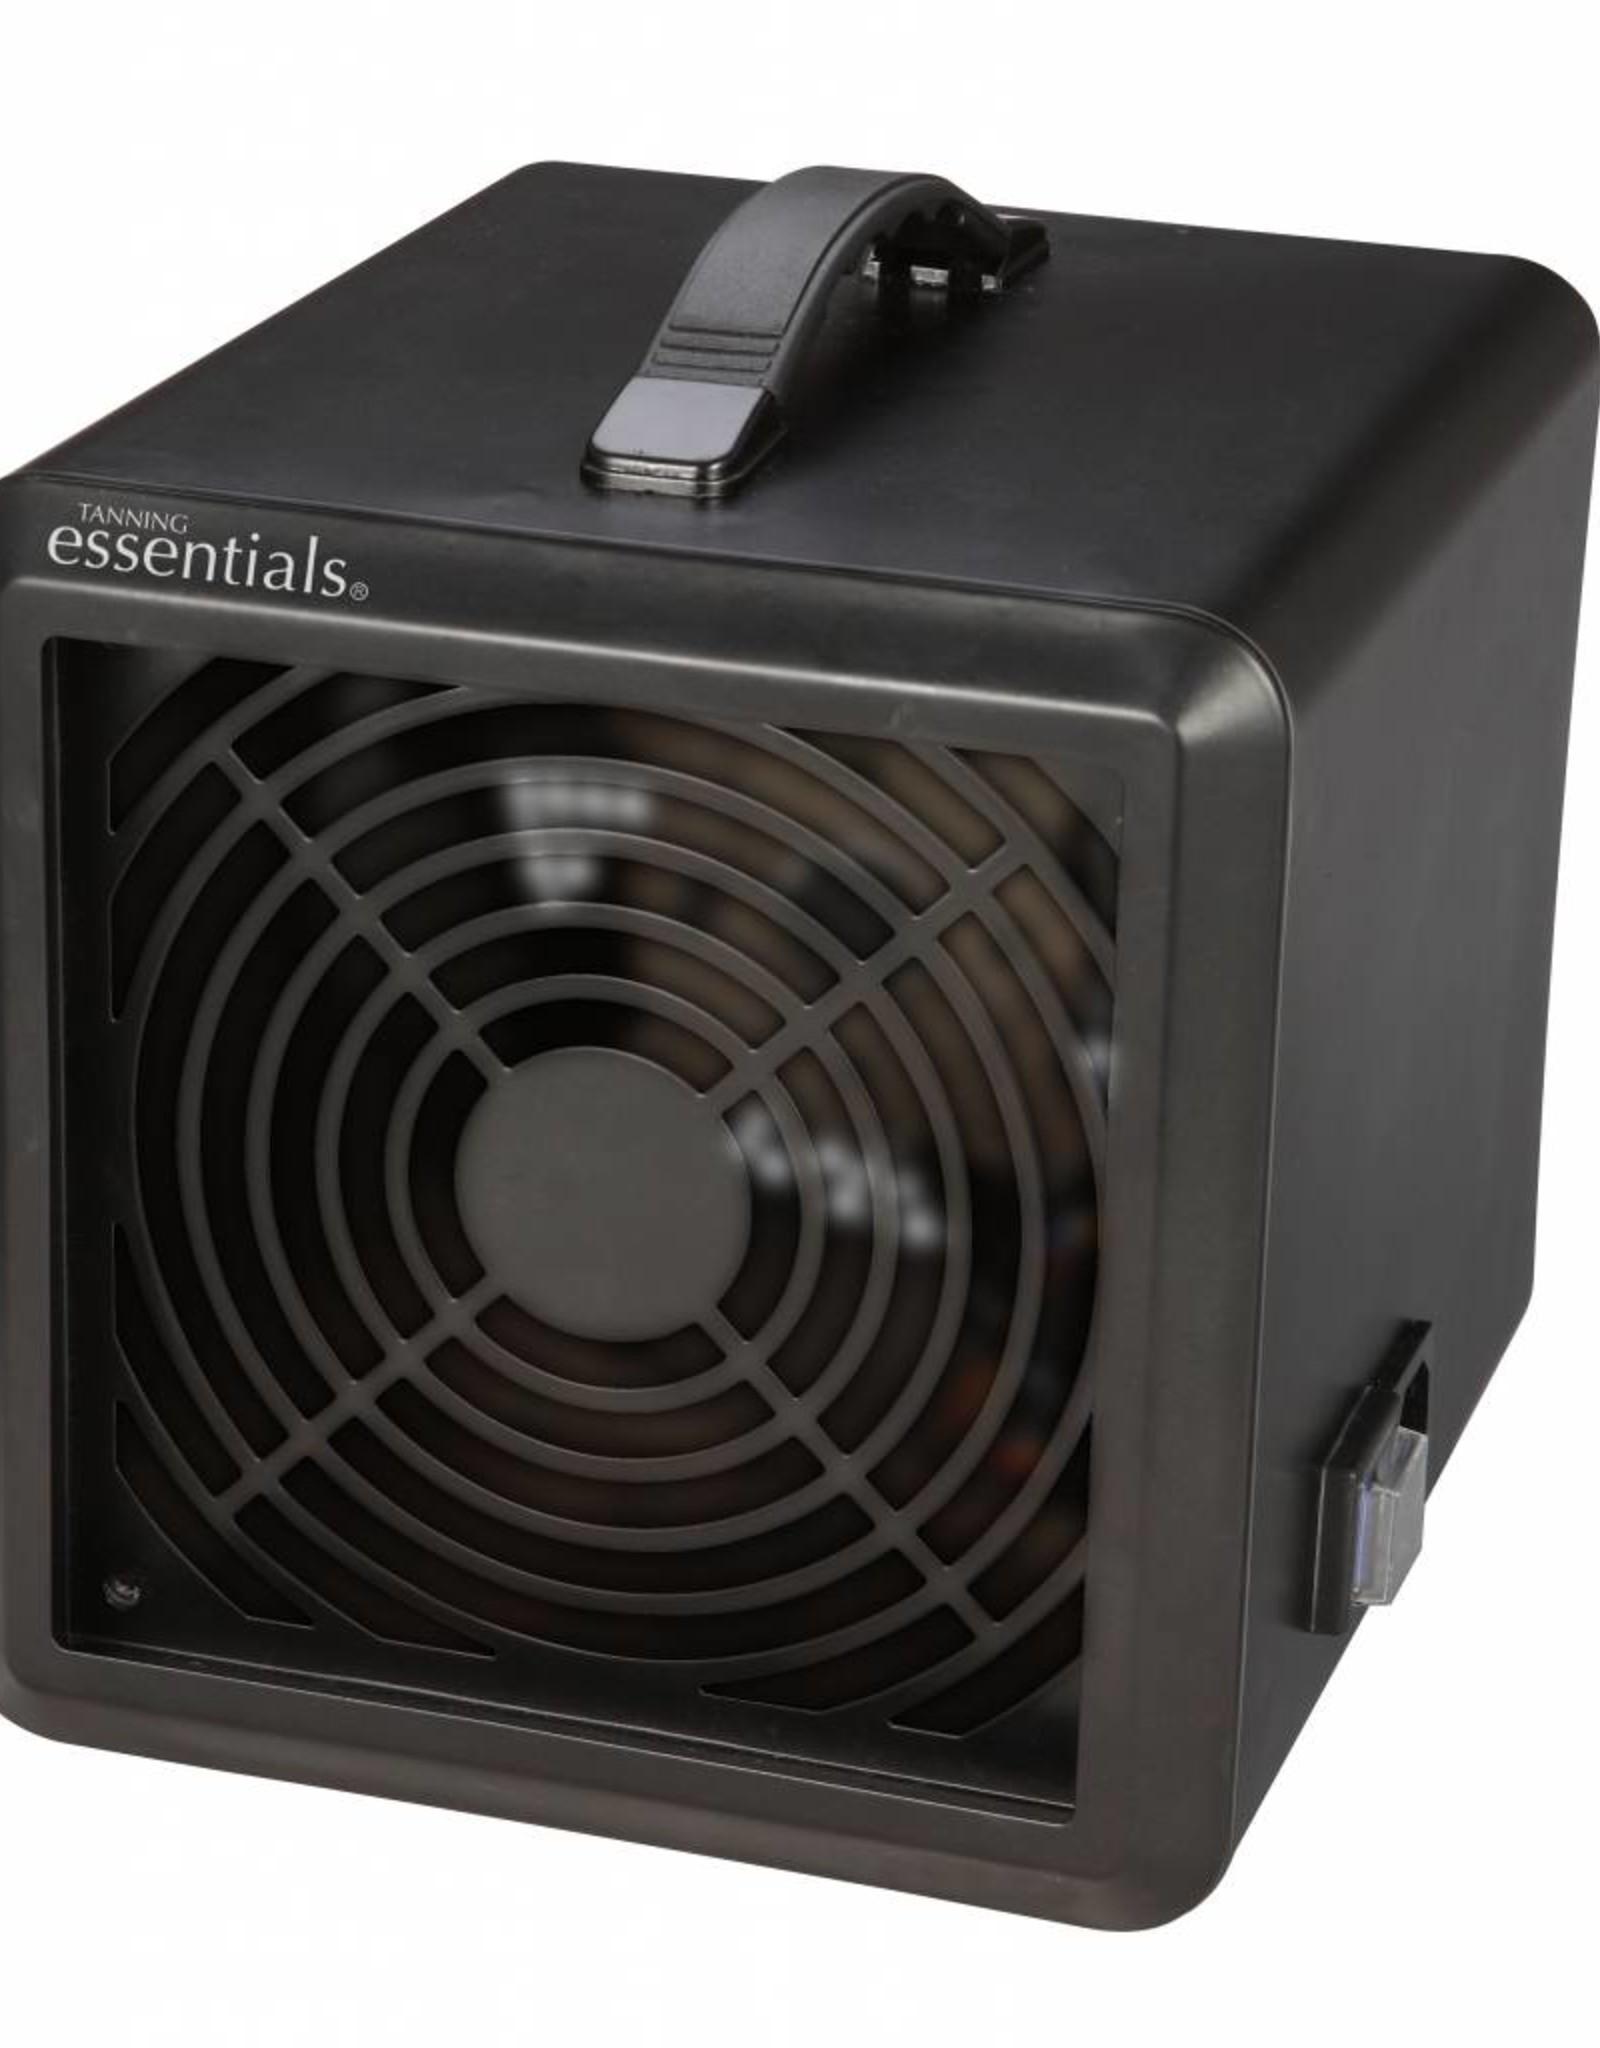 Tanning Essentials  'Mini Mobil' Turbo Twister afzuiging ventilator